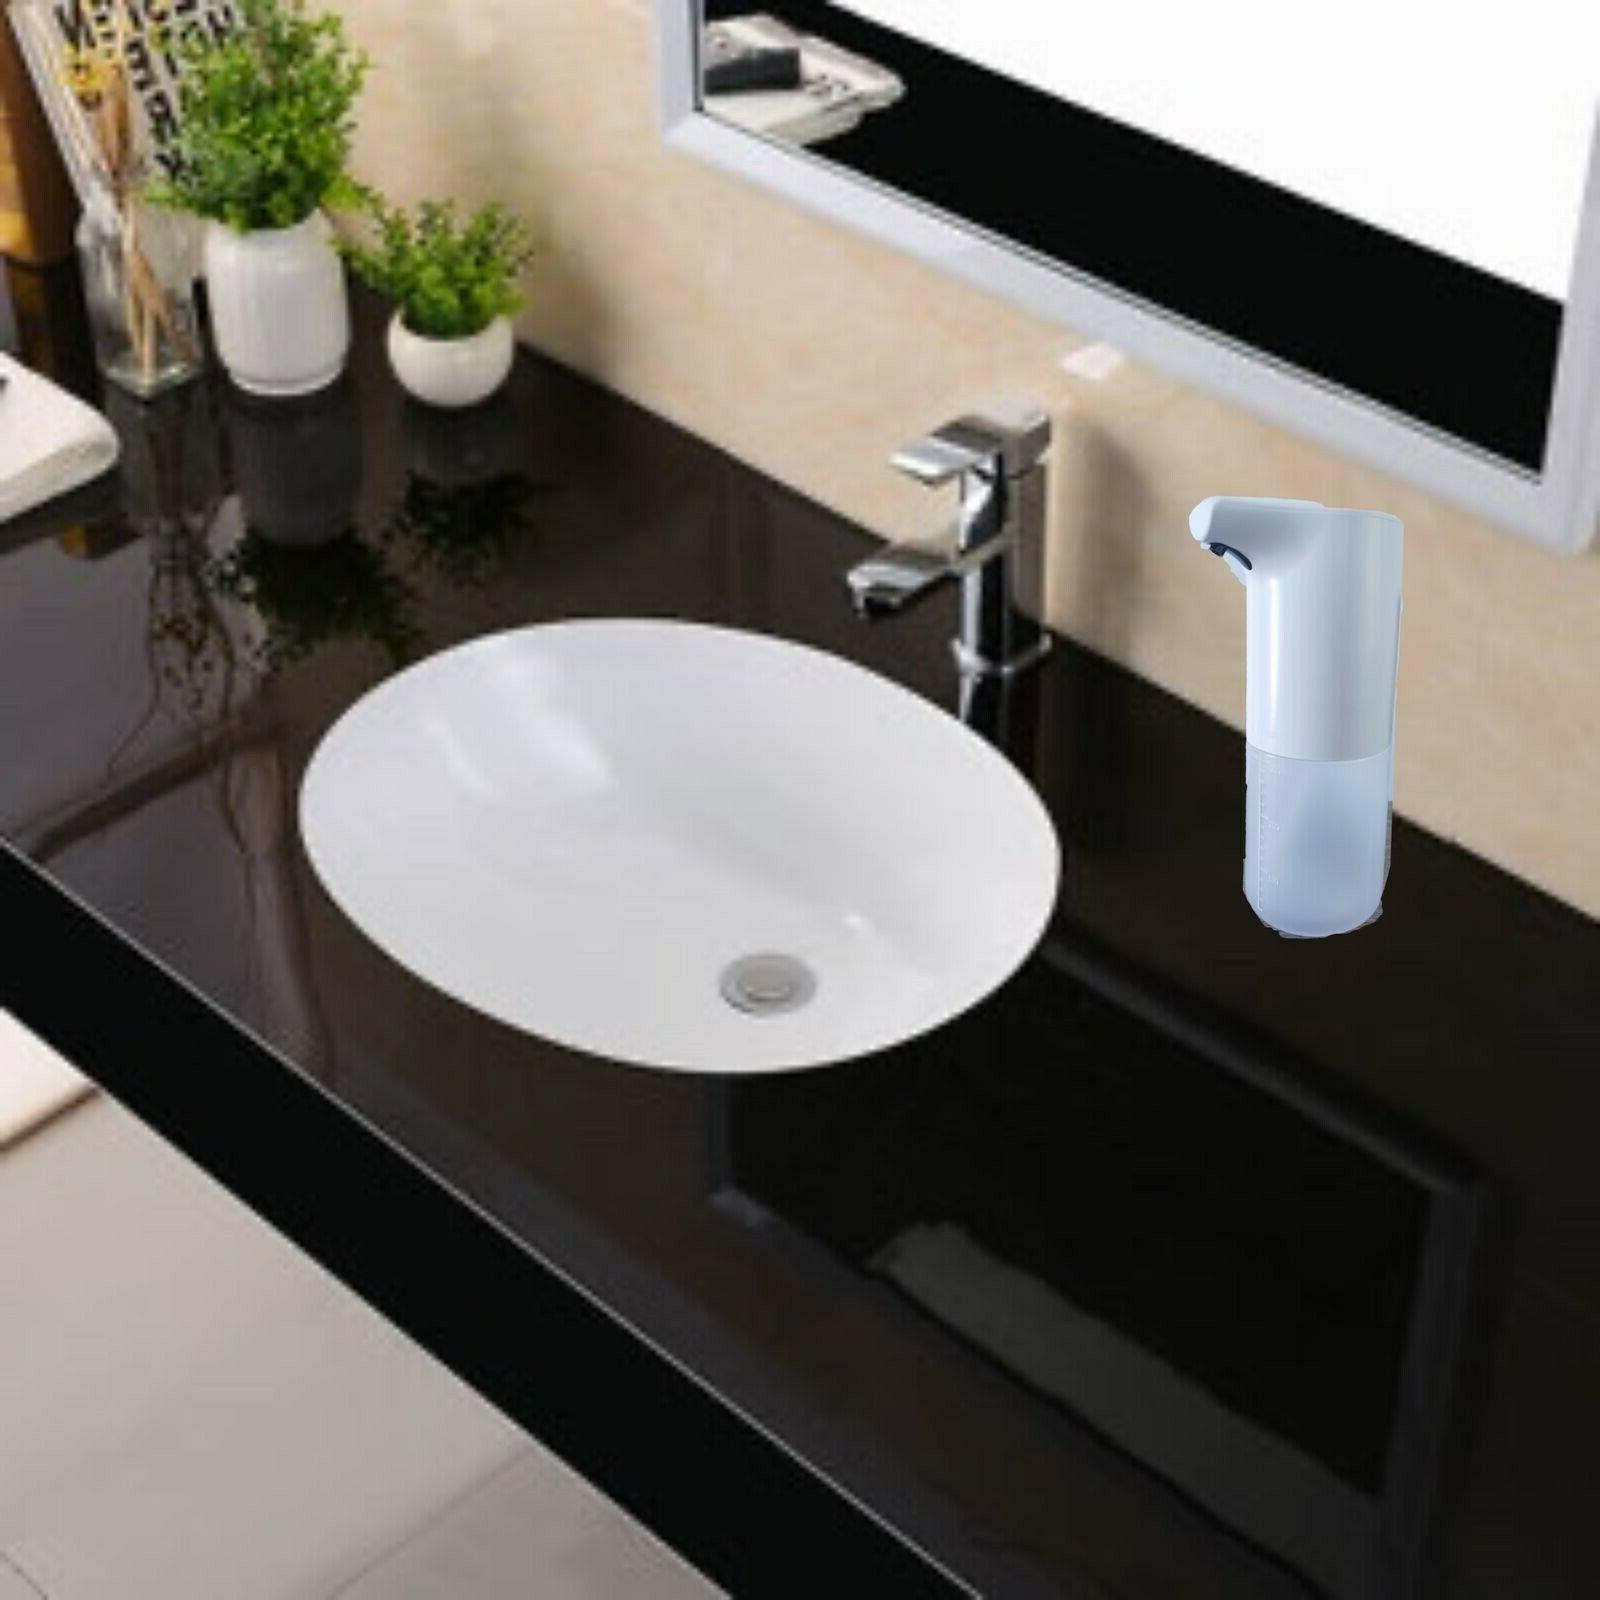 350ml Dispenser Hands-Free Touchless Foaming